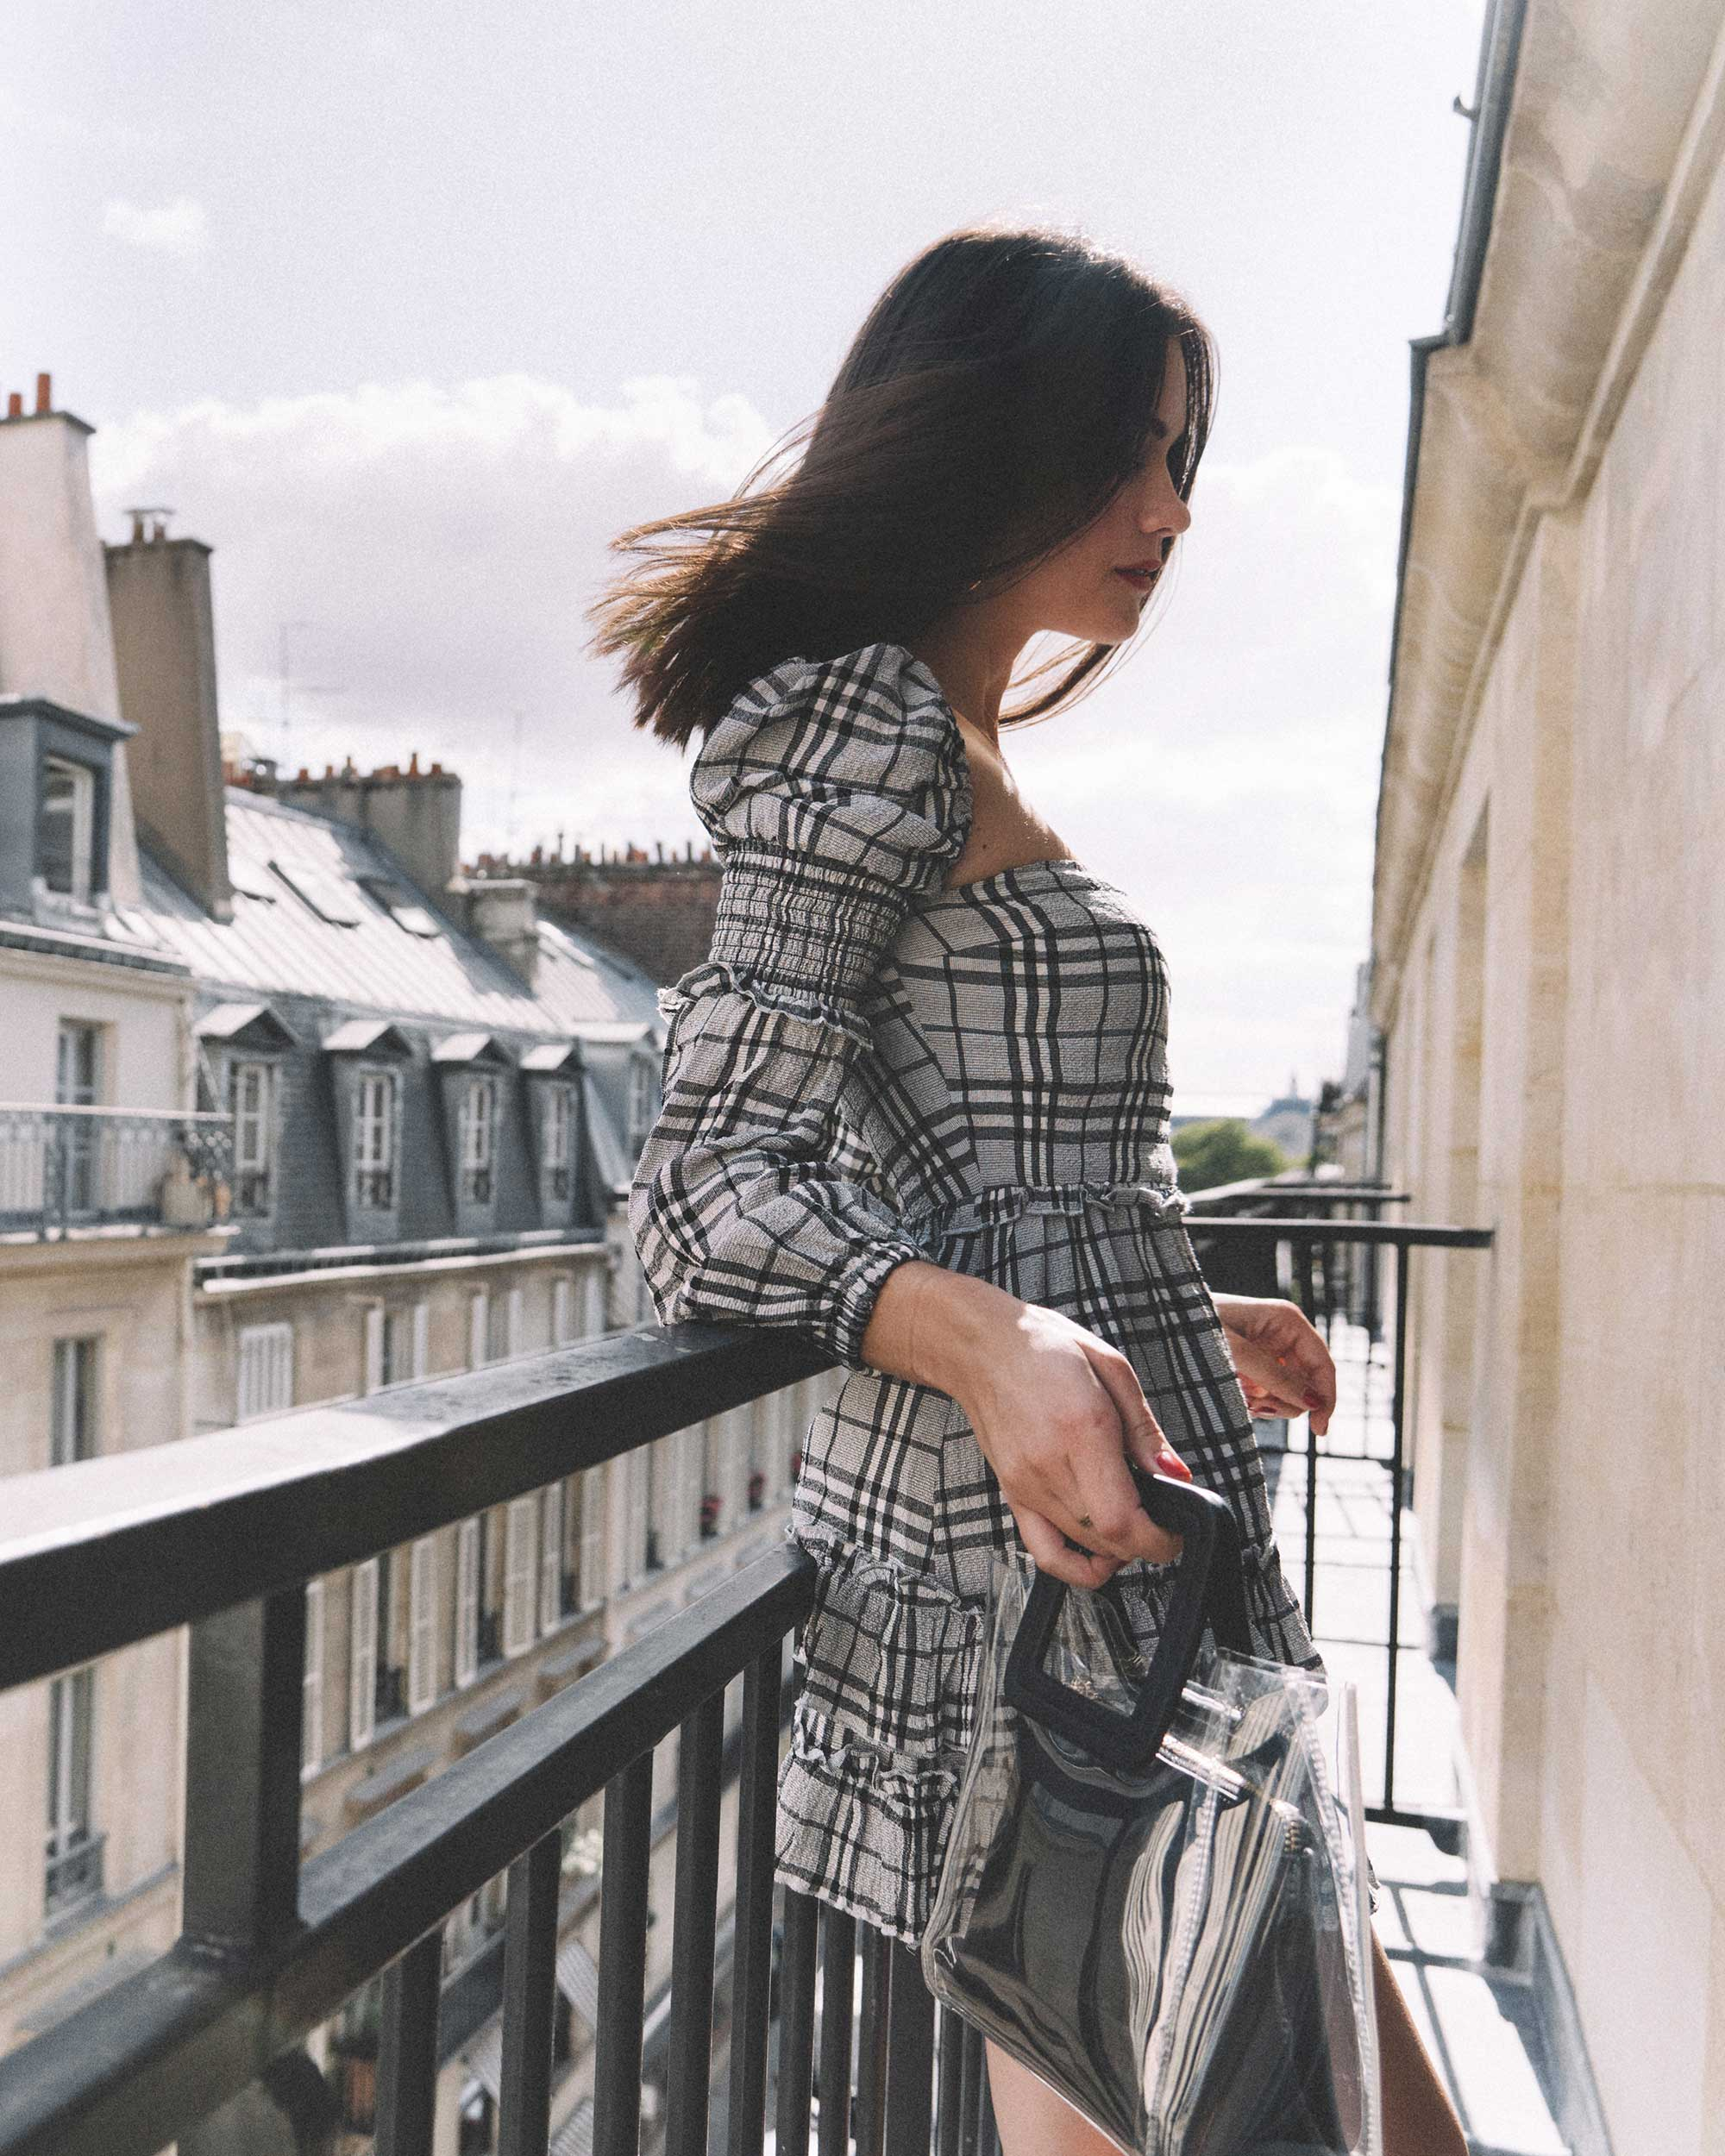 MAJORELLE Plaid Long Sleeve Dress Paris Girl Balcony Outfit1.jpg